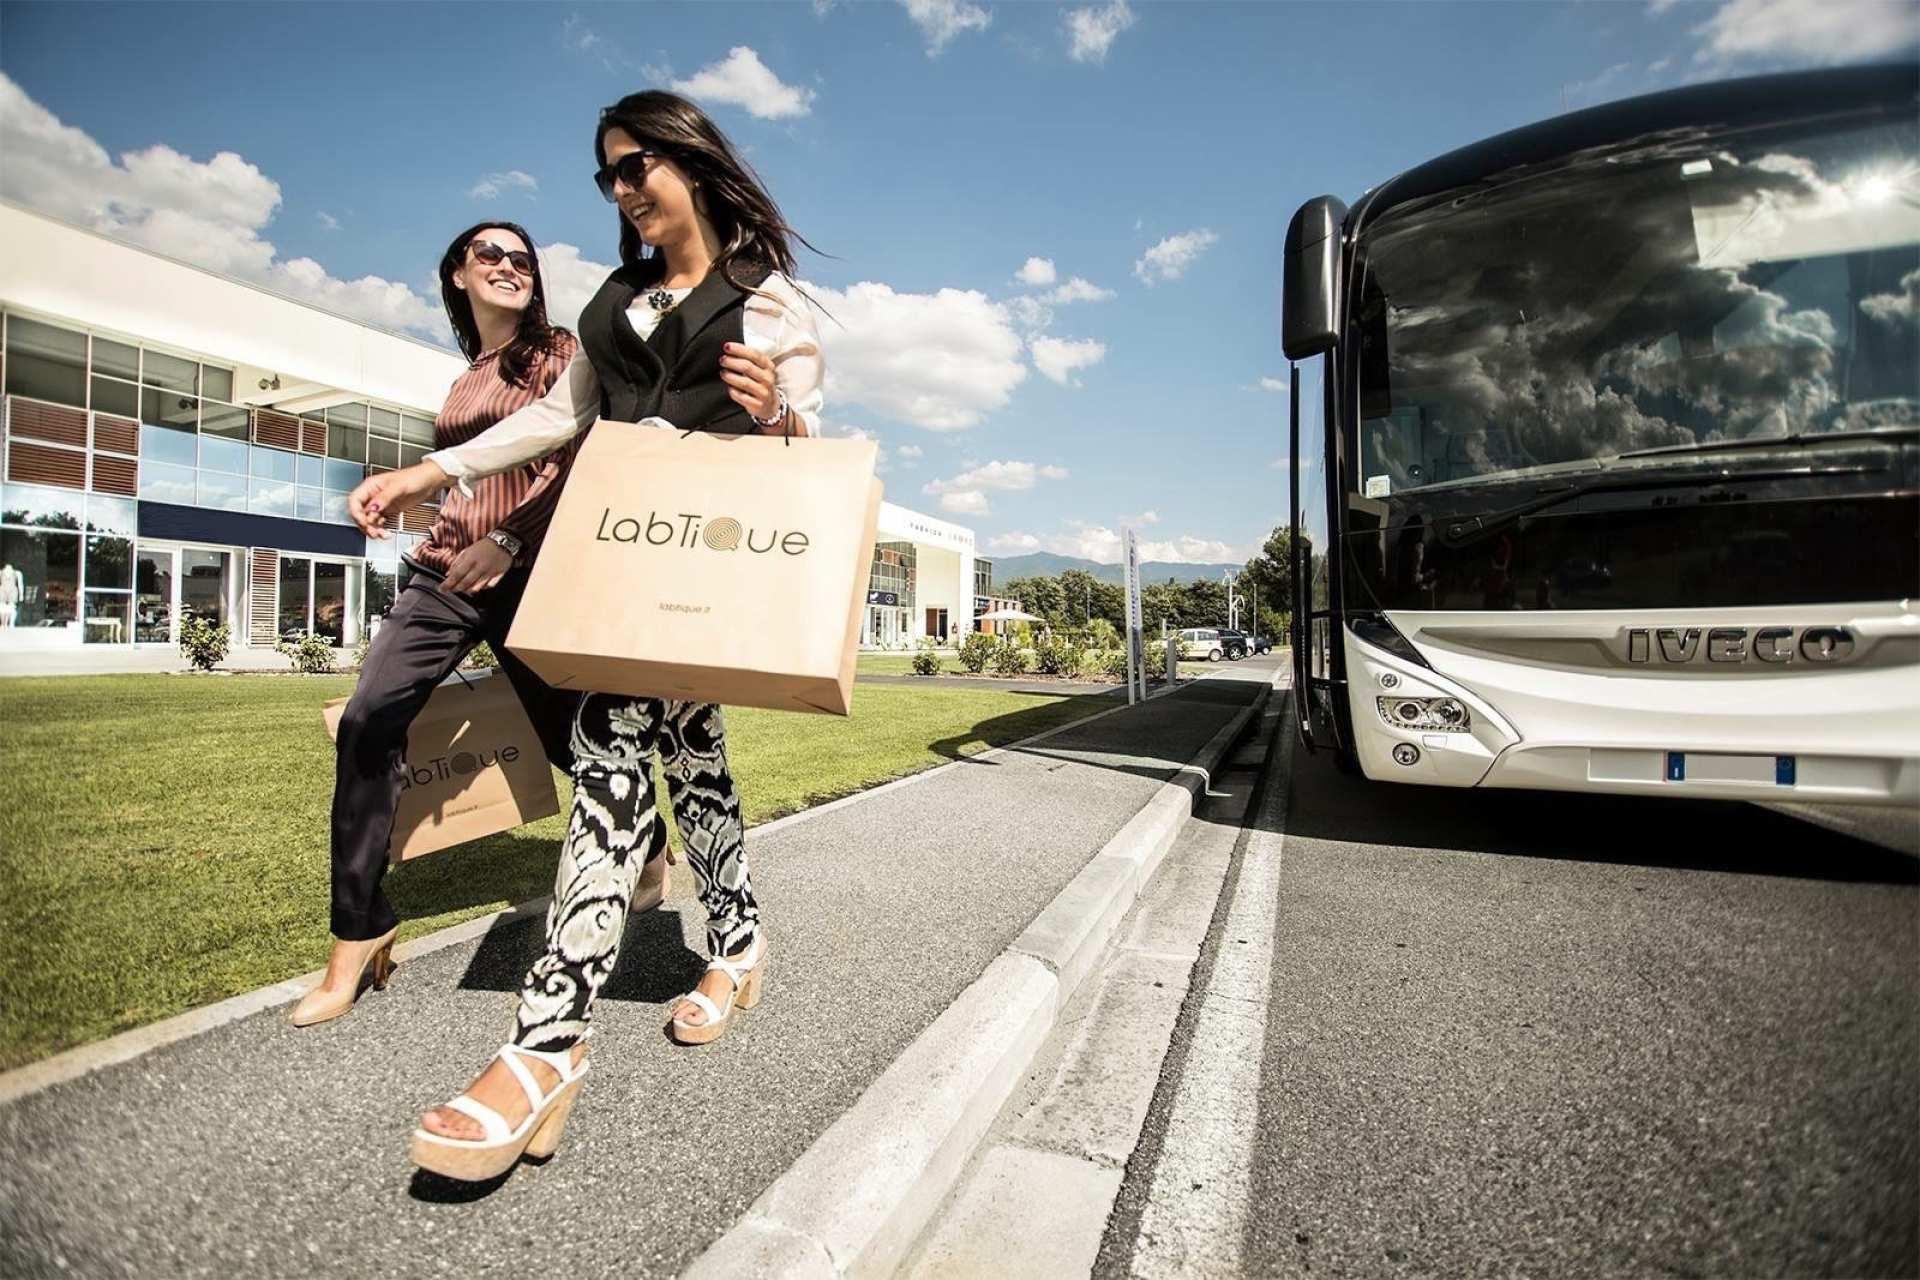 【佛羅倫斯購物村】The Mall Luxury Outlets 往返接駁巴士